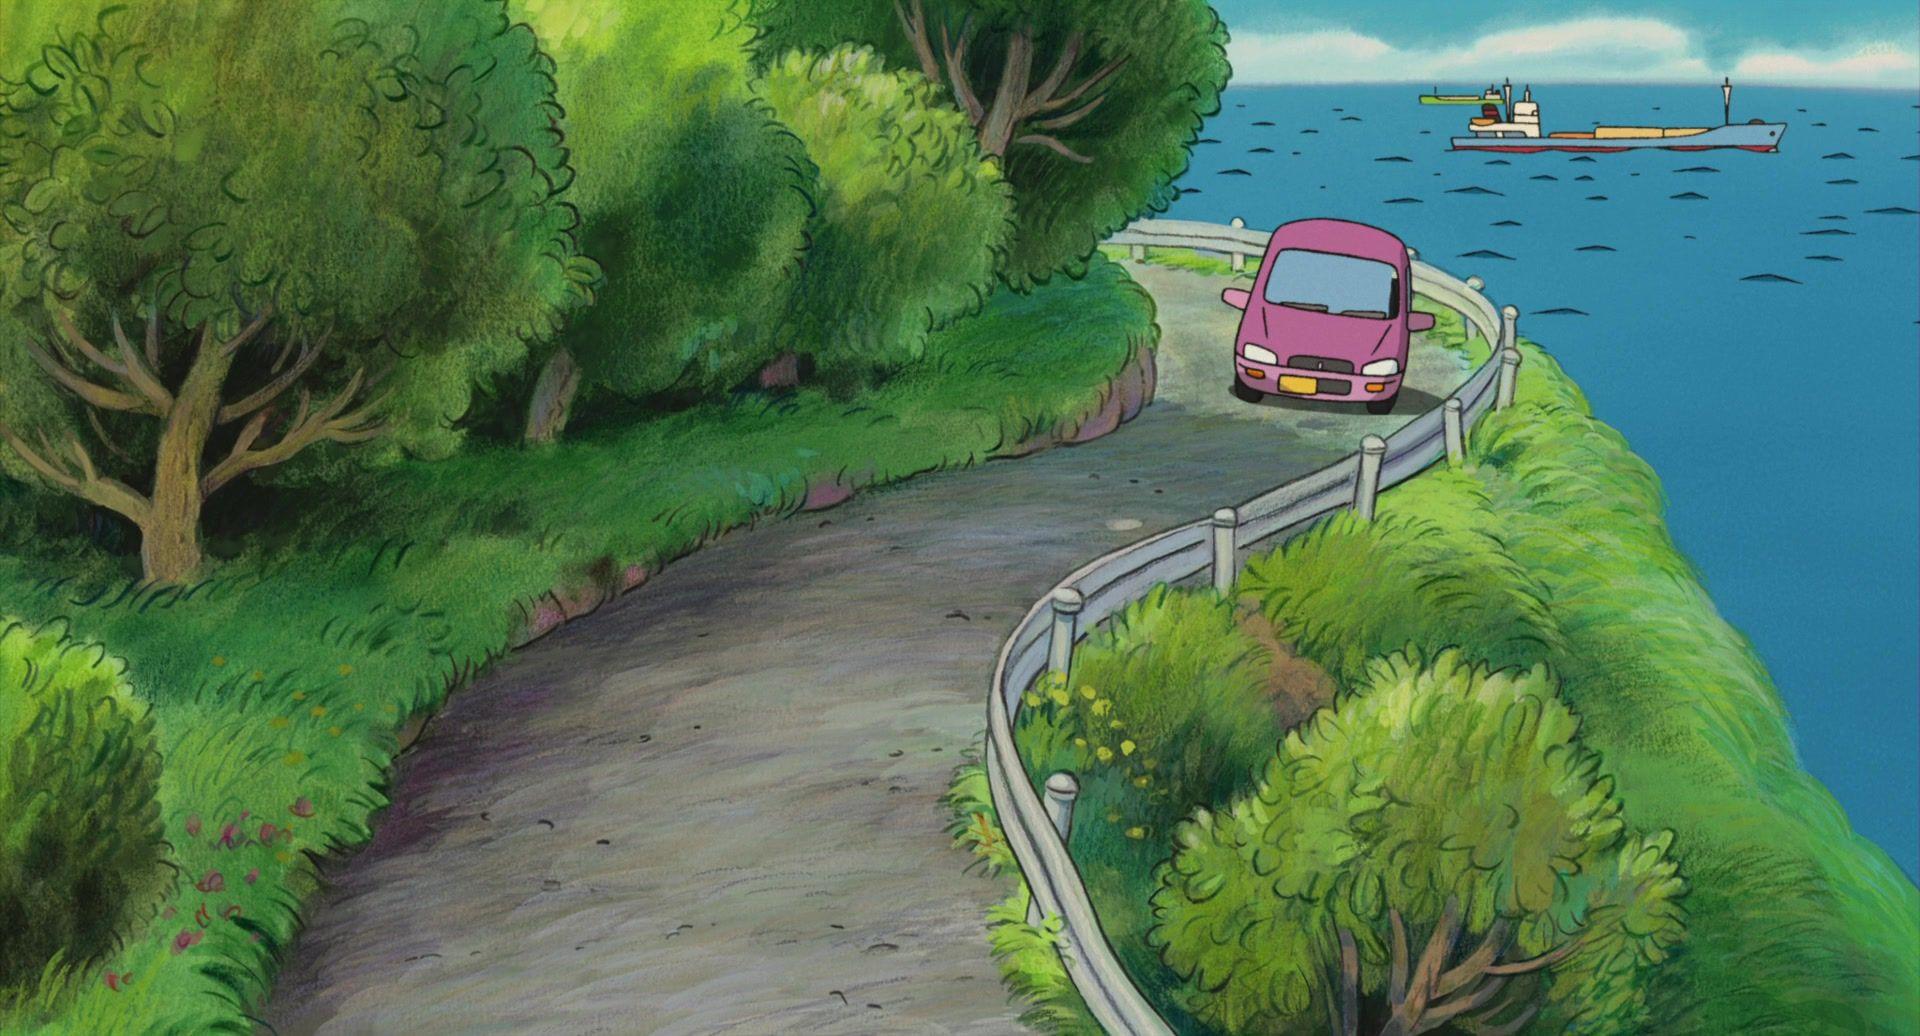 Screencap and Image For Ponyo Studio ghibli